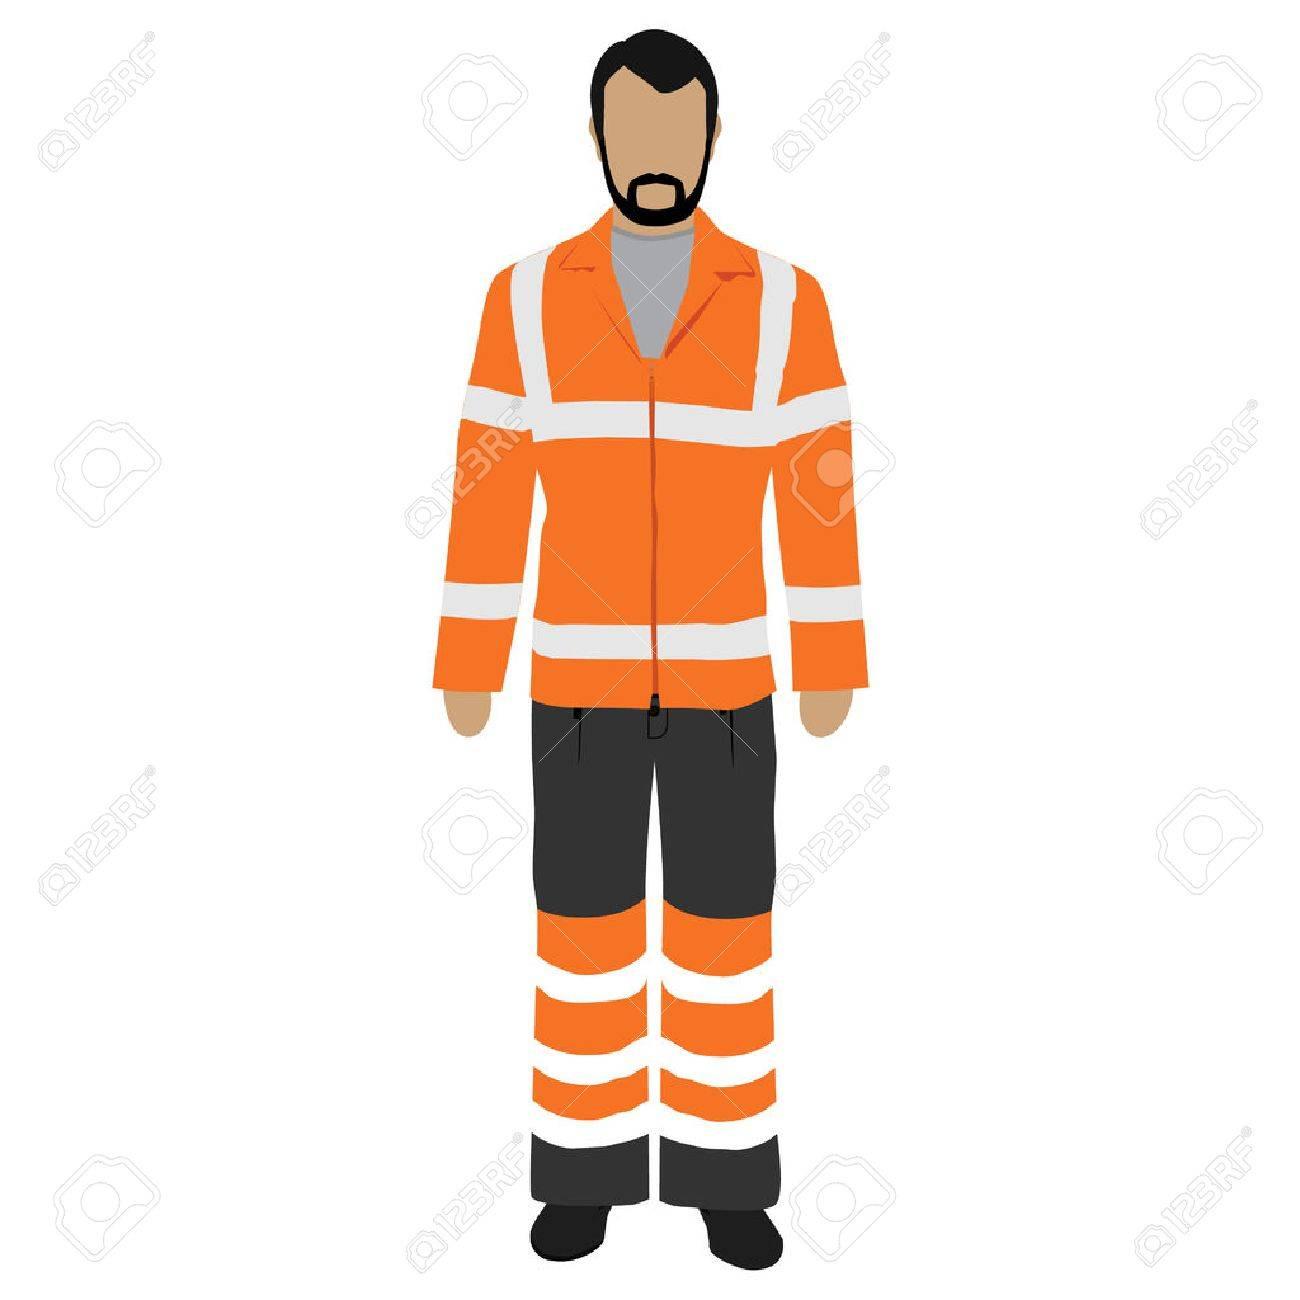 Vector illustration worker in orange safety jacket. Worker safety clothing. Protective worker uniform jacket with reflective stripes. - 69461951